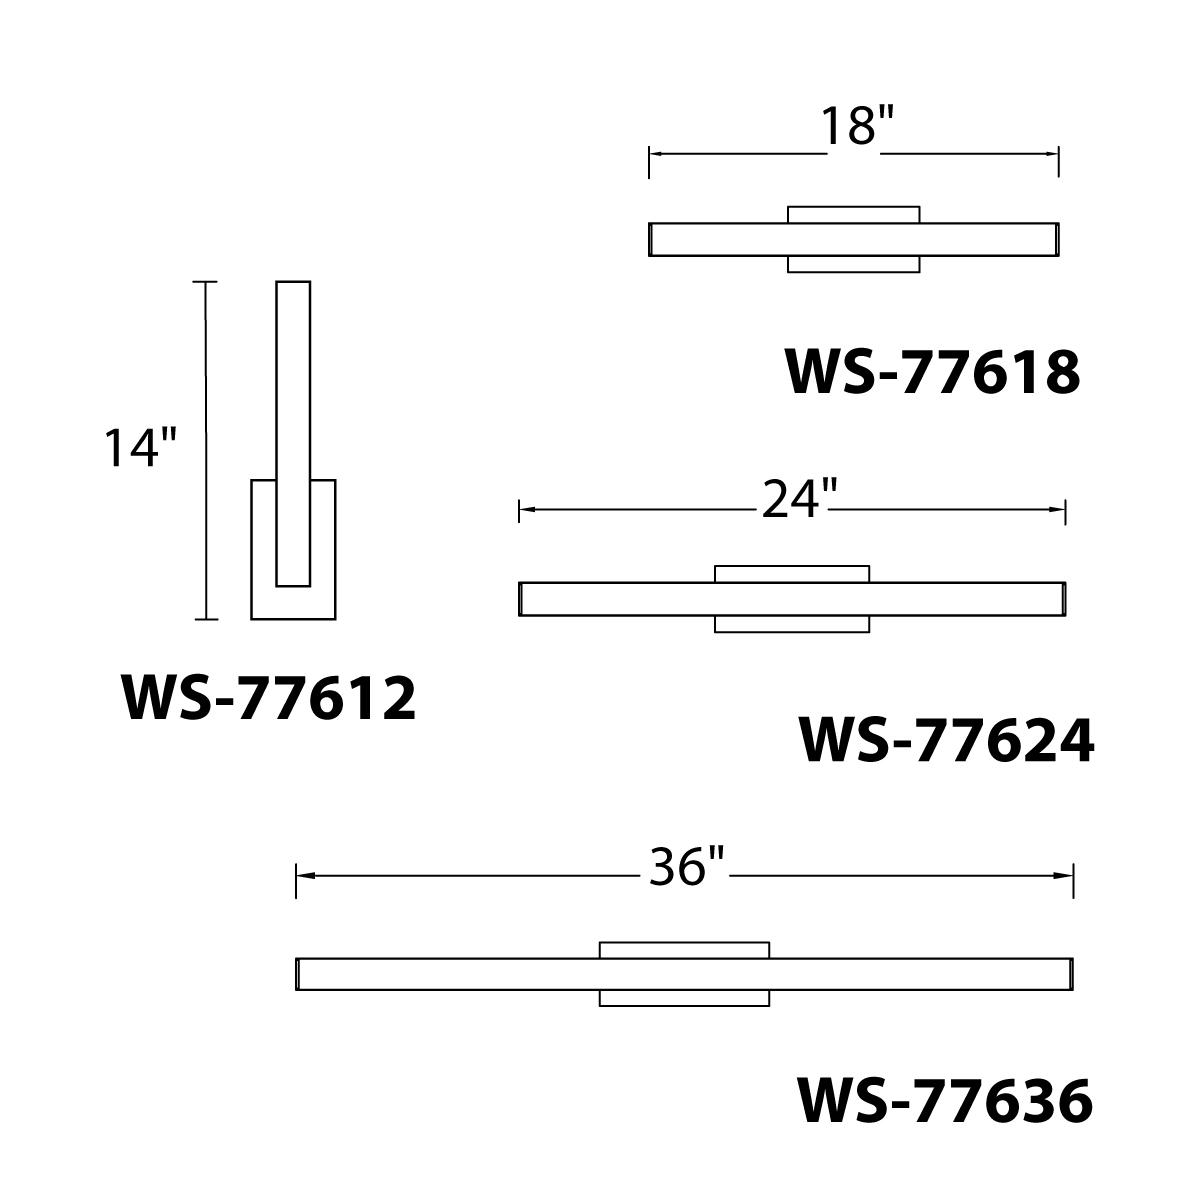 hight resolution of wac lighting wiring diagram wiring diagram user brink wac lighting wiring diagram